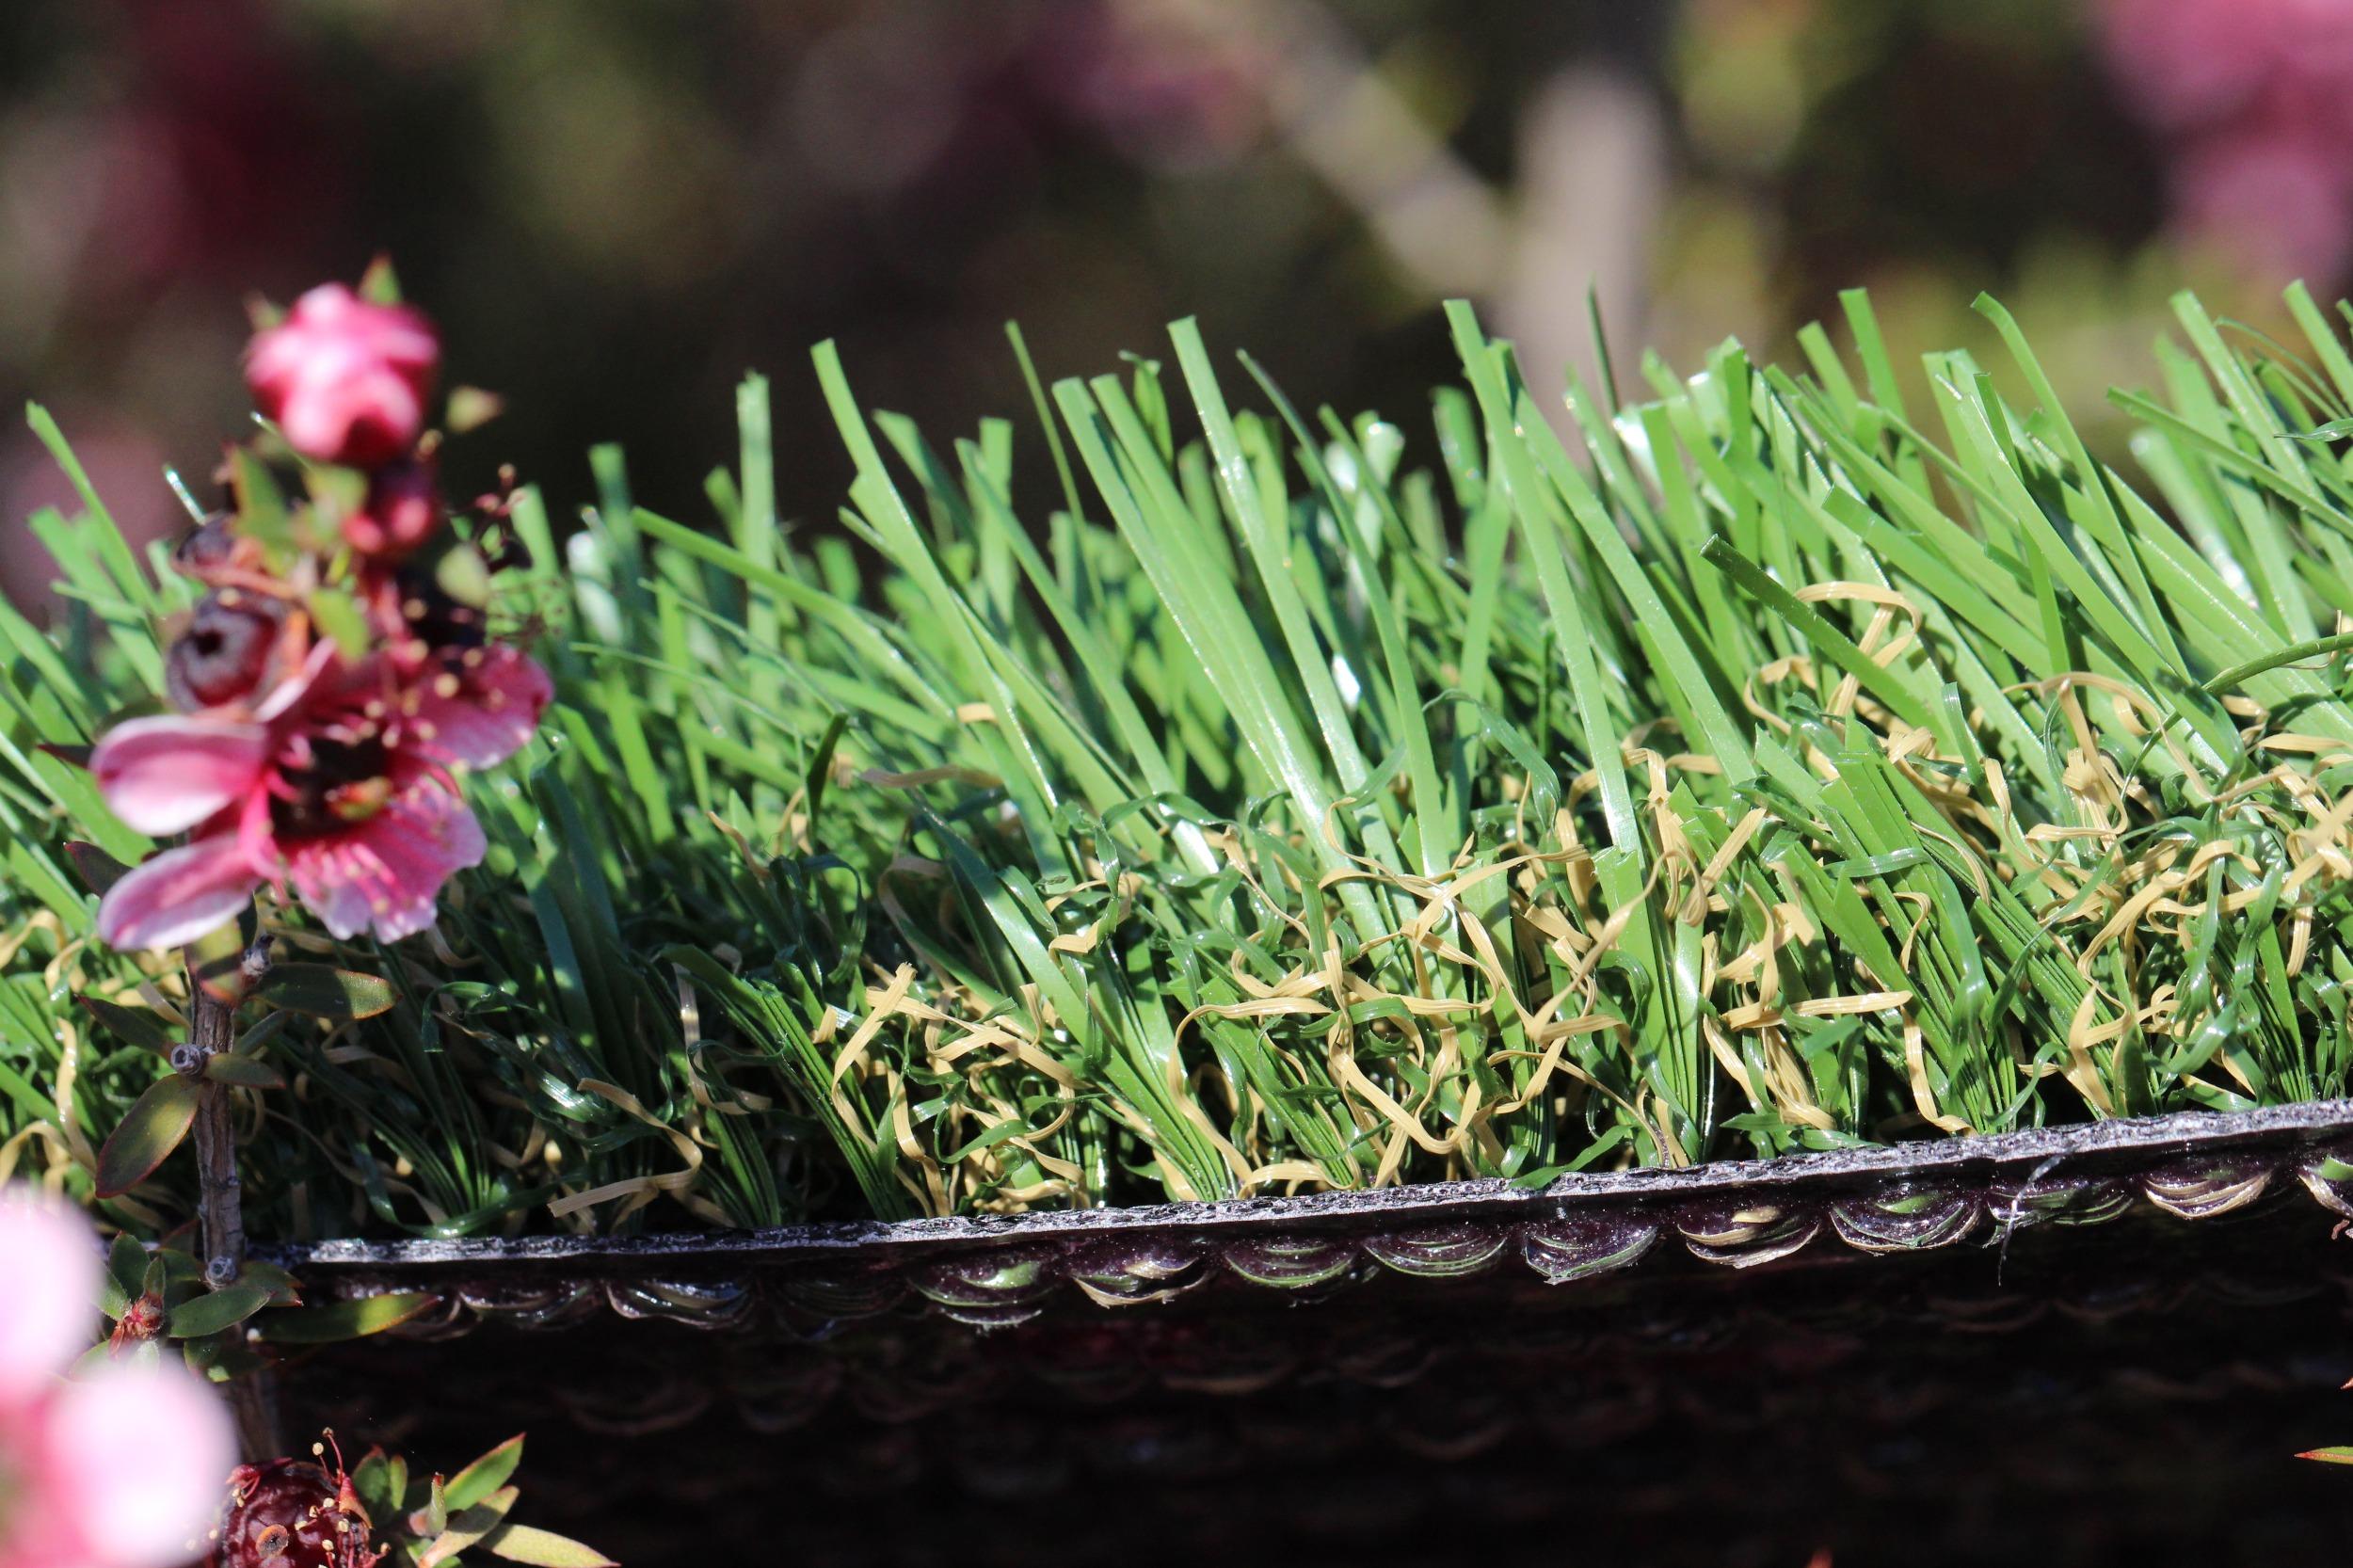 Emerald-46 Outdoor Artificial Grass For Lawns